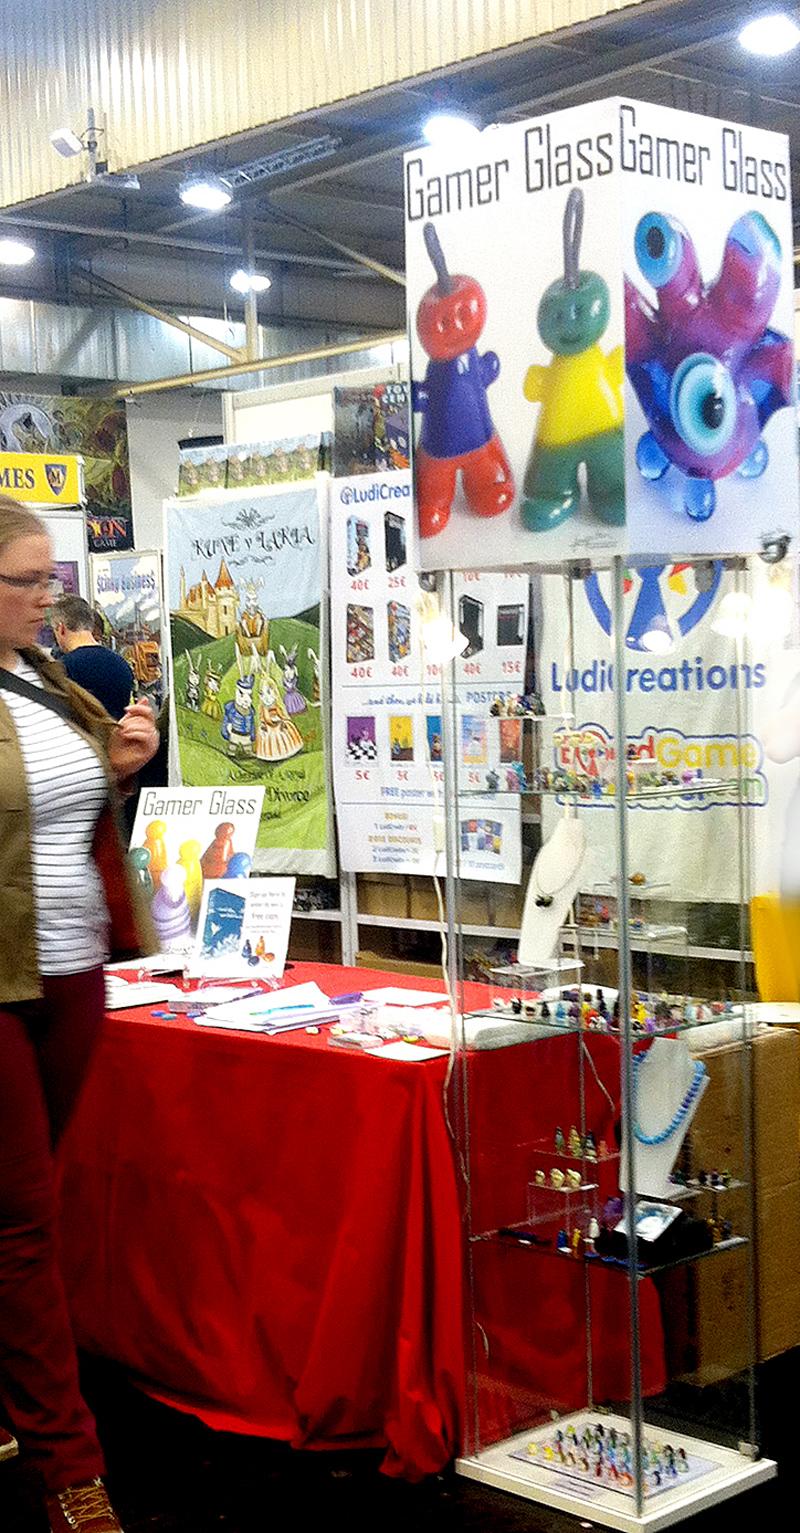 Jenefer Ham Glass at LudiCreations stand at Essen Spiel 2015